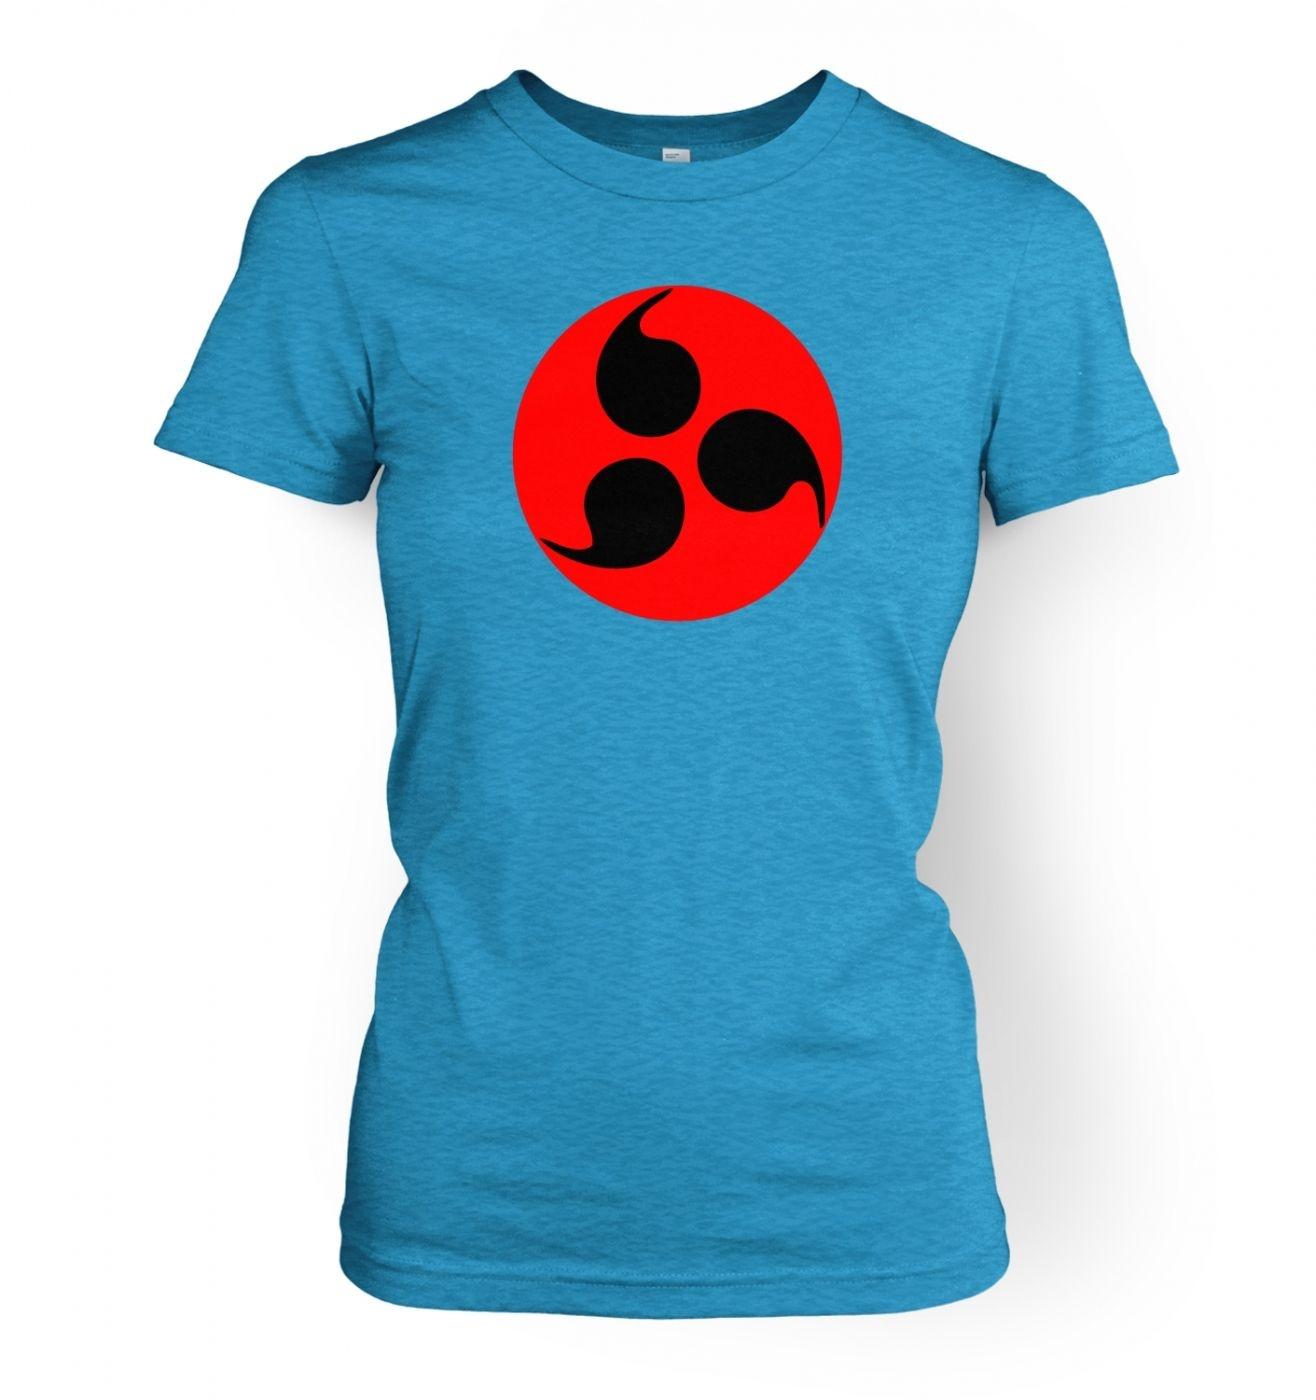 Sharingan Eye women's fitted t-shirt